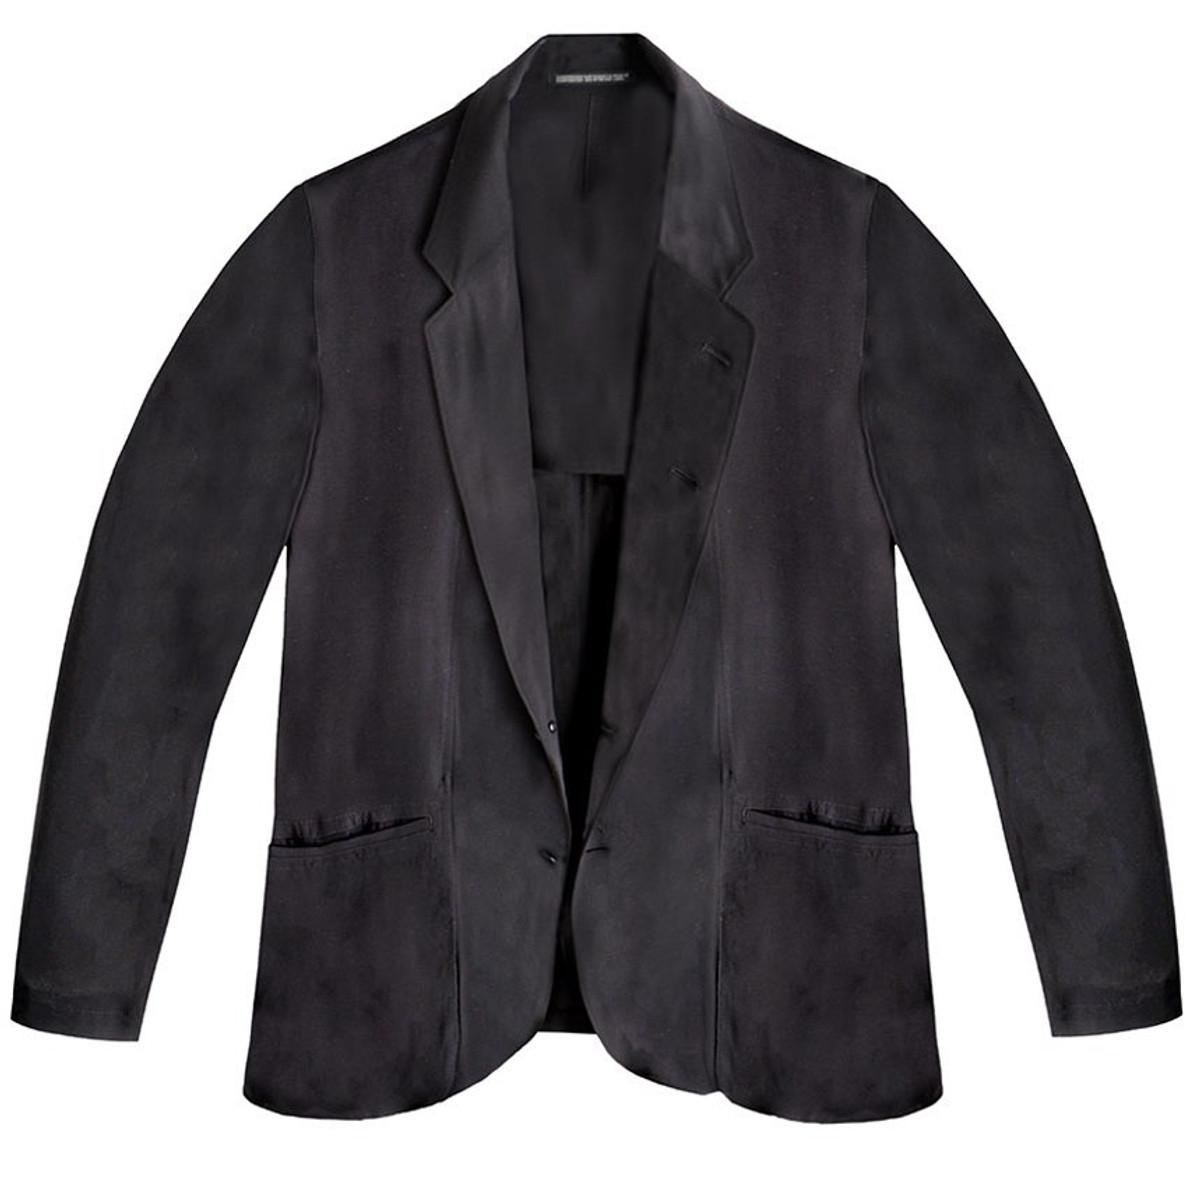 d8ba99a1ef35 Yohji Yamamoto Black Lawn Suit with Draped Pockets